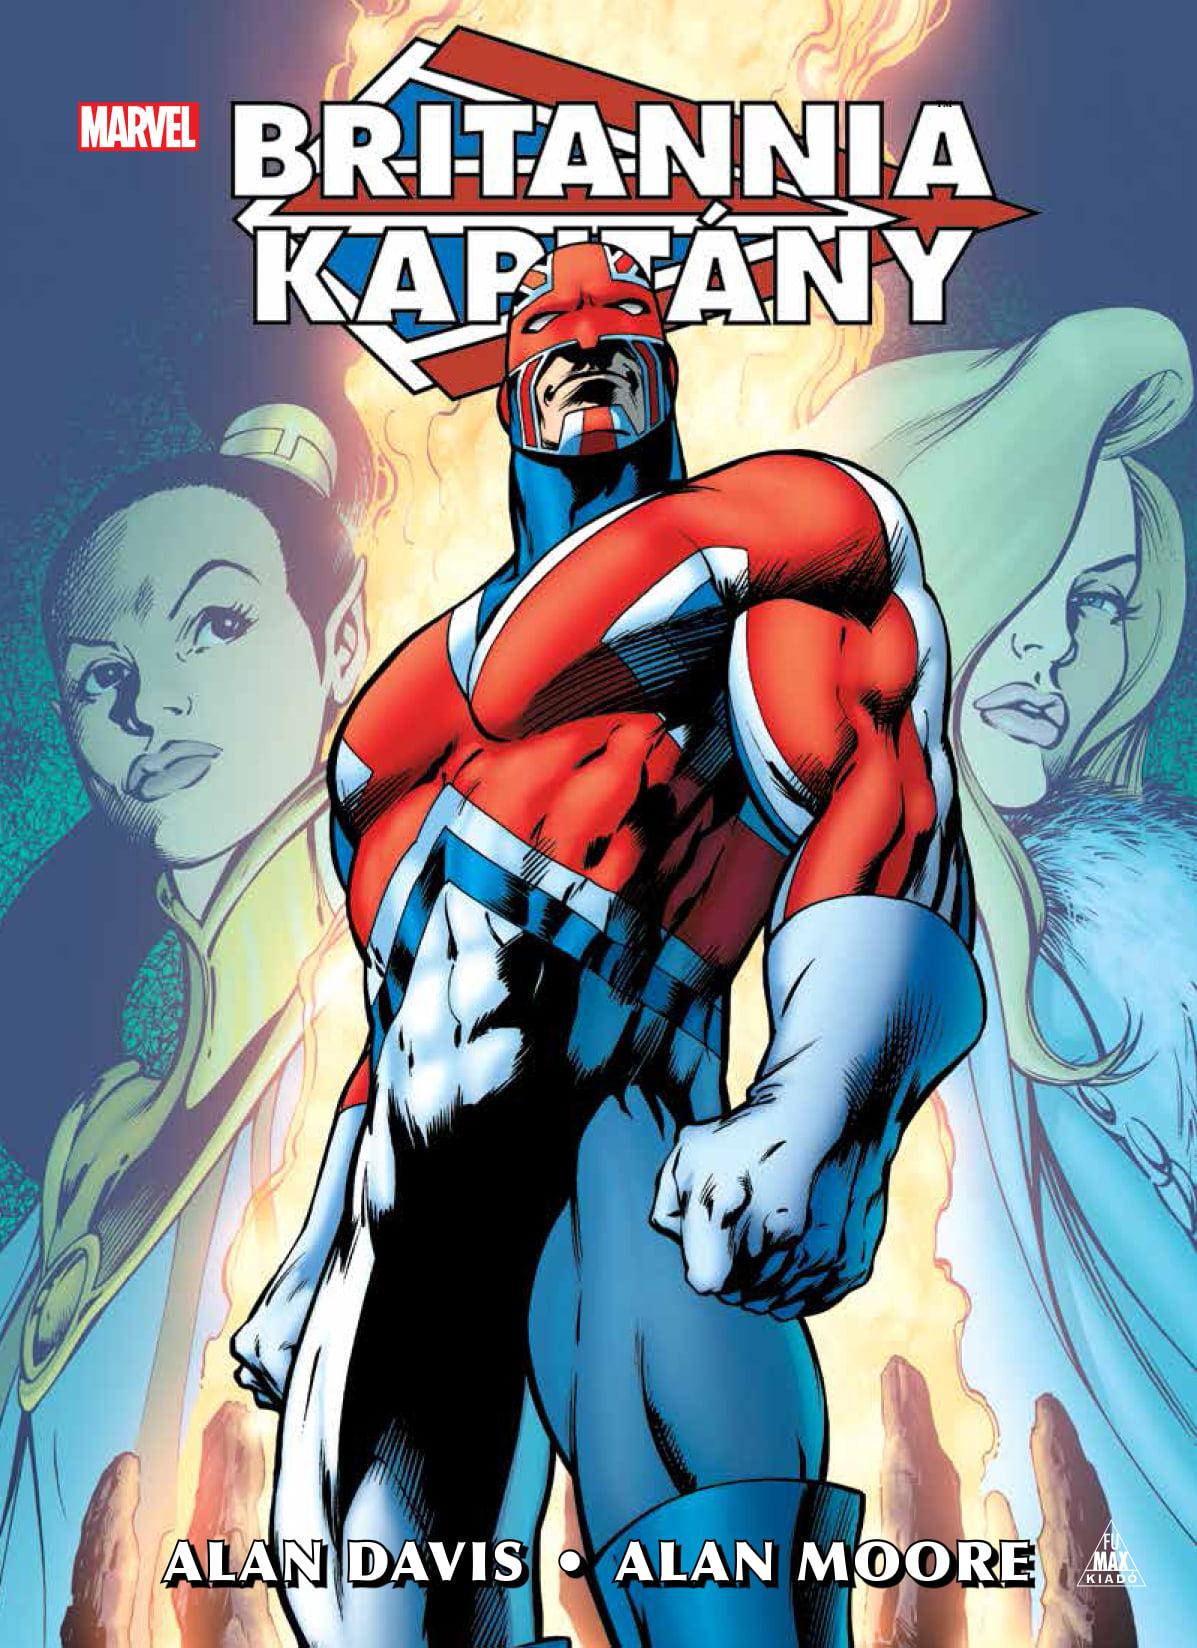 britannia-kapitany-cover.jpg